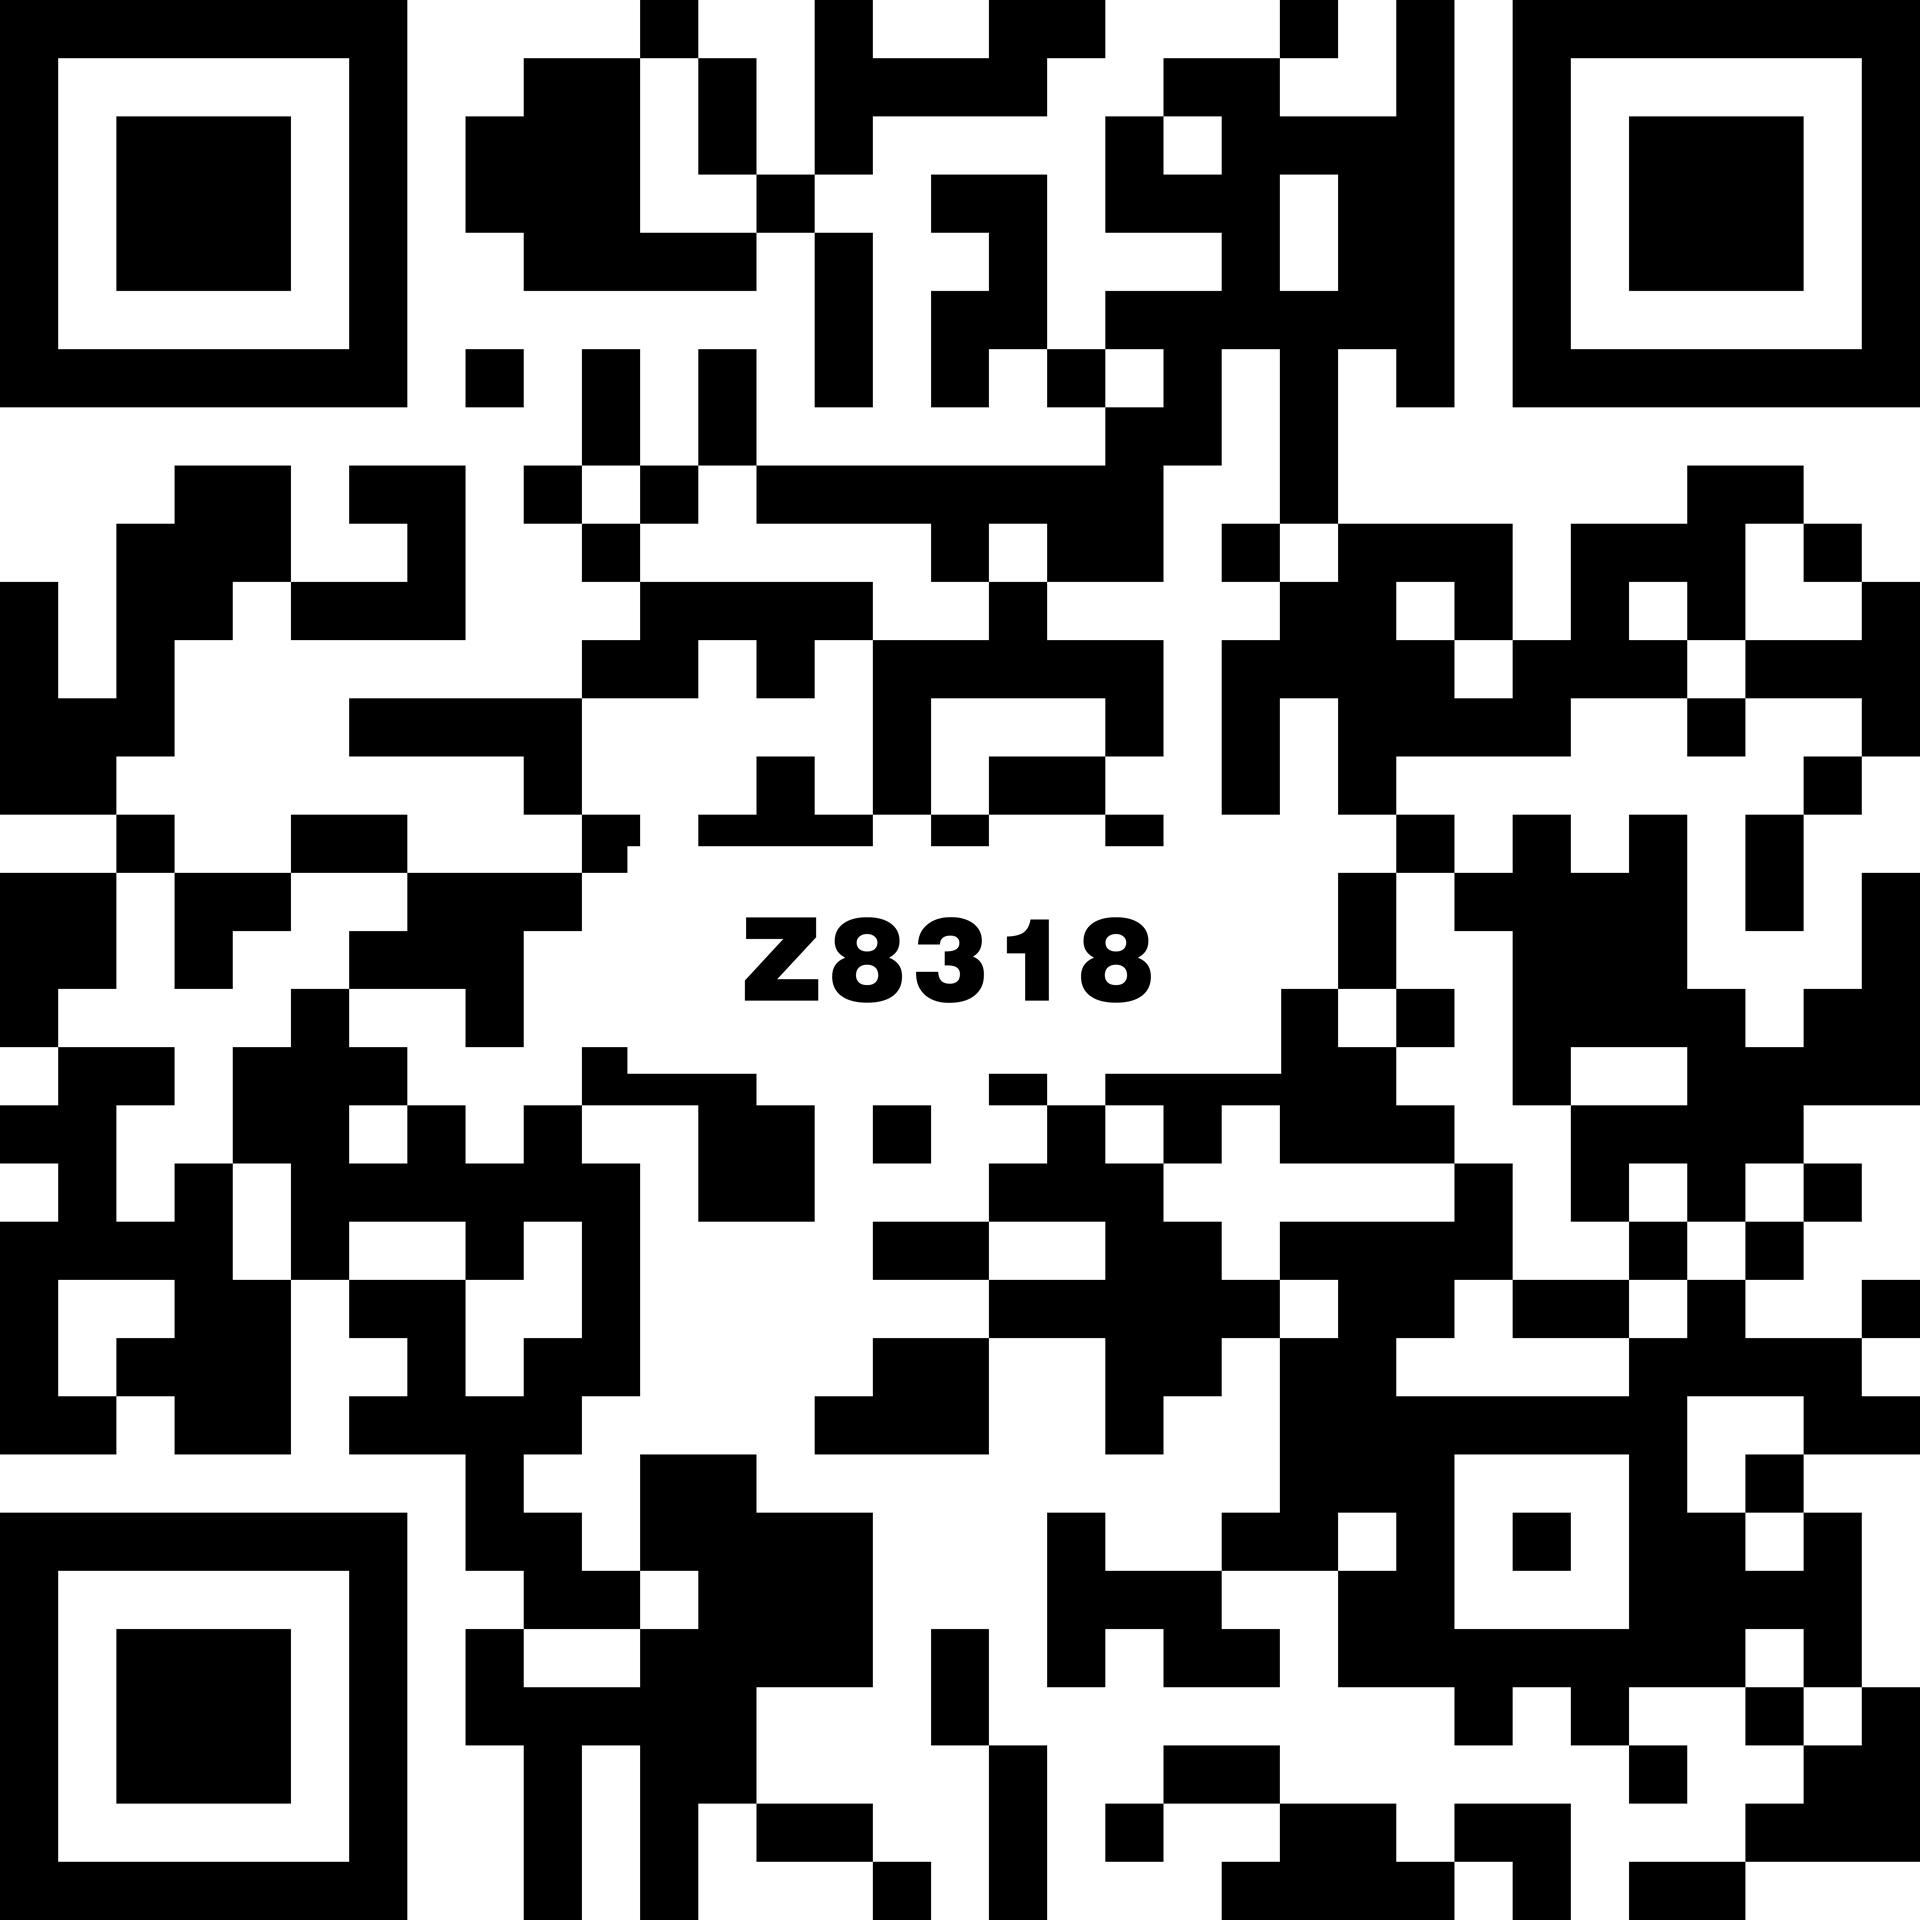 Z8318